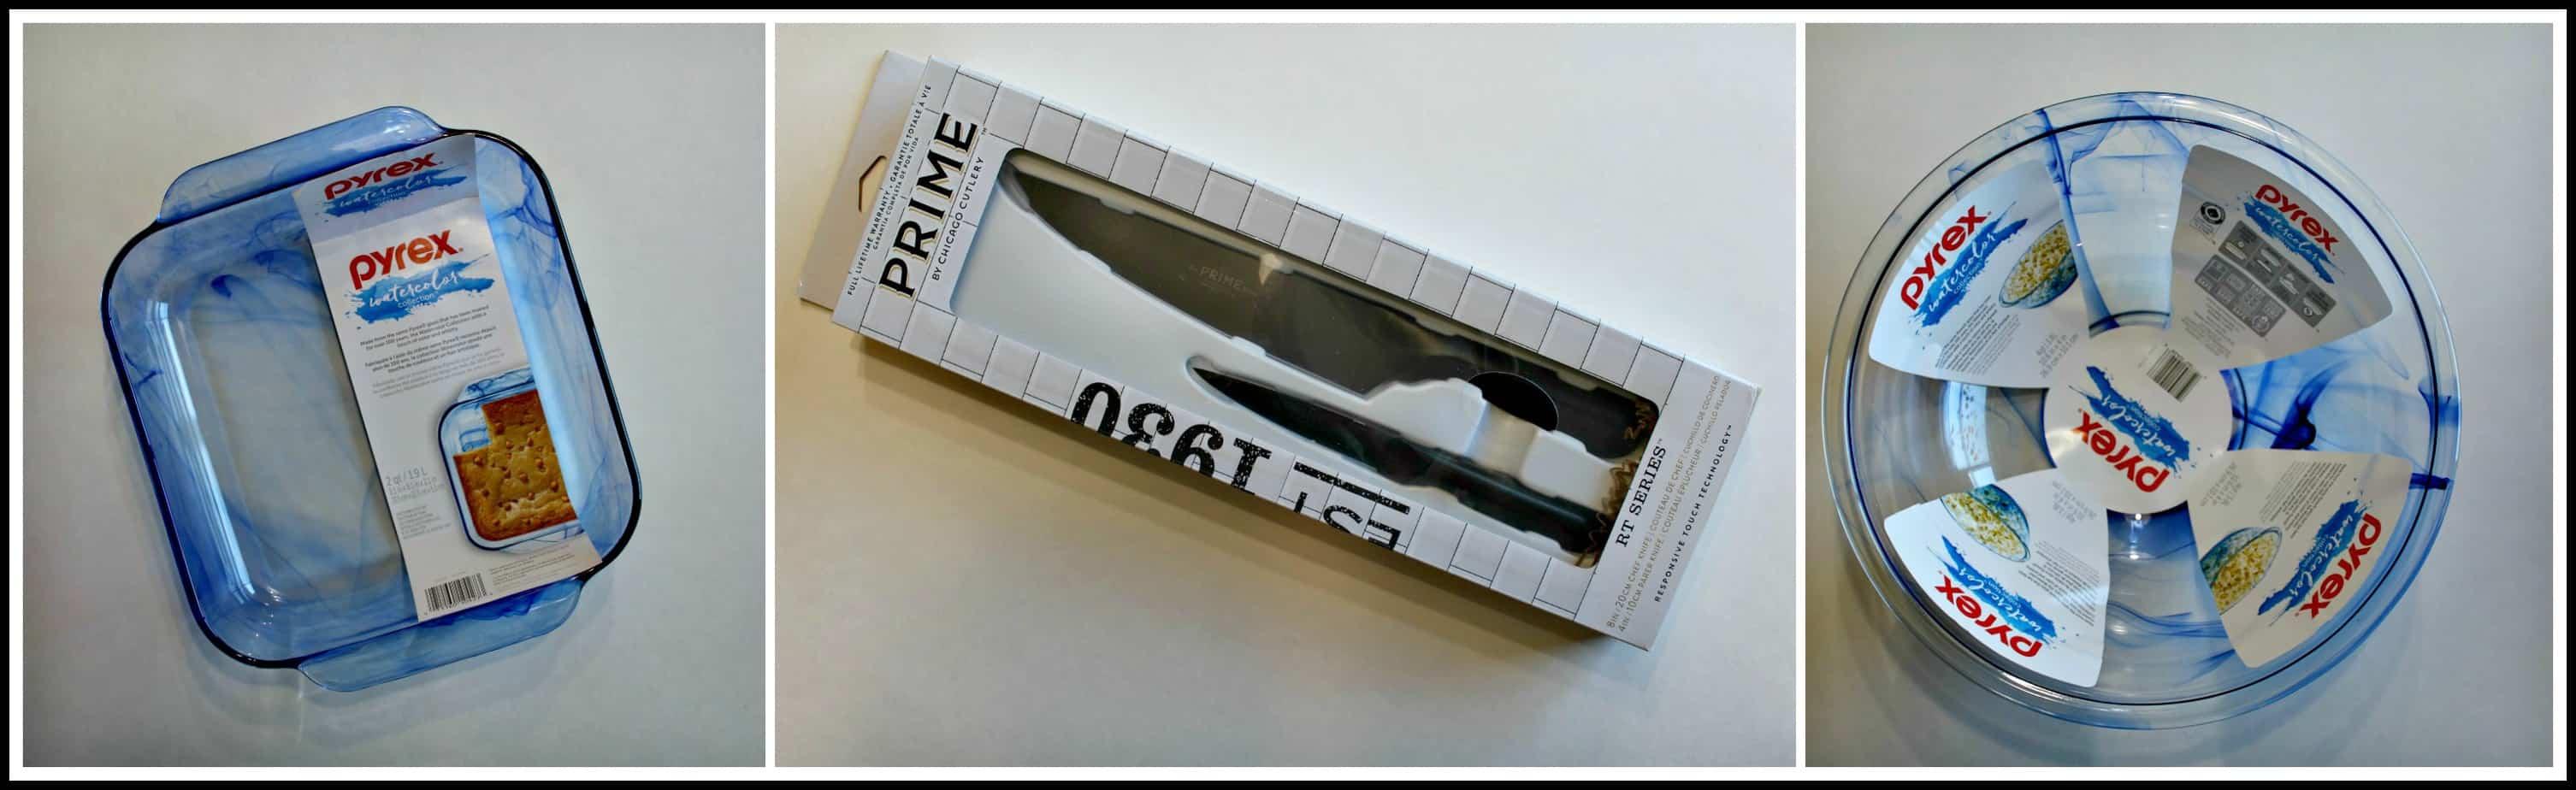 PRIME Chicago Cutlery & Pyrex